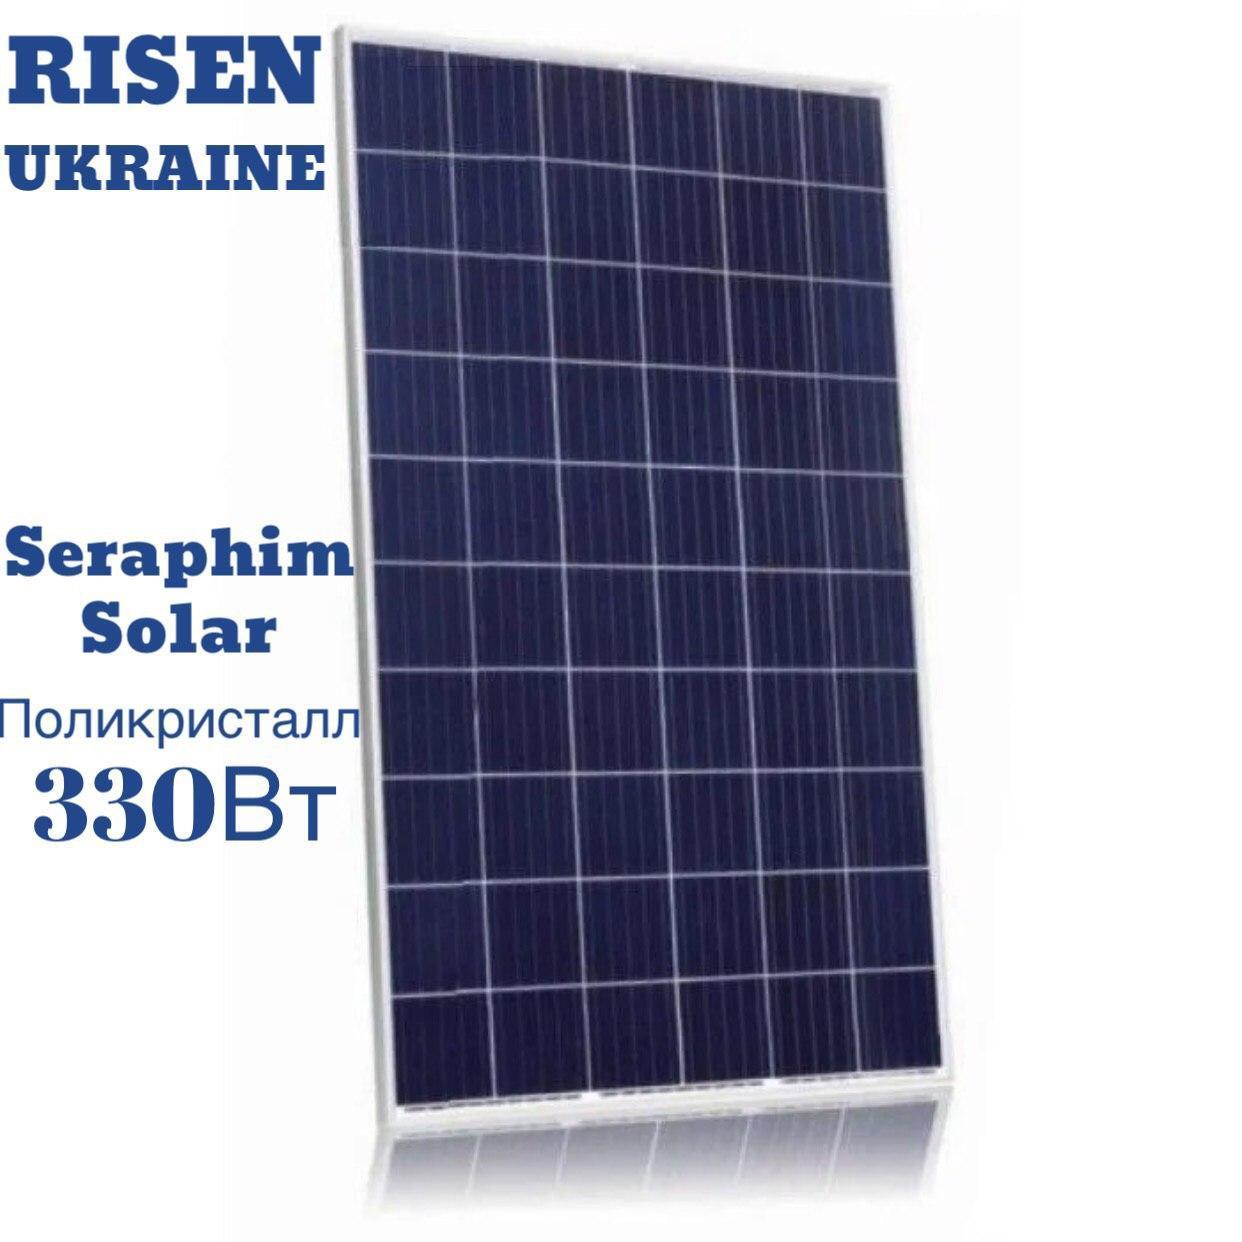 Солнечная батарея (поликристалл) Seraphim Solar 330W Tier-1